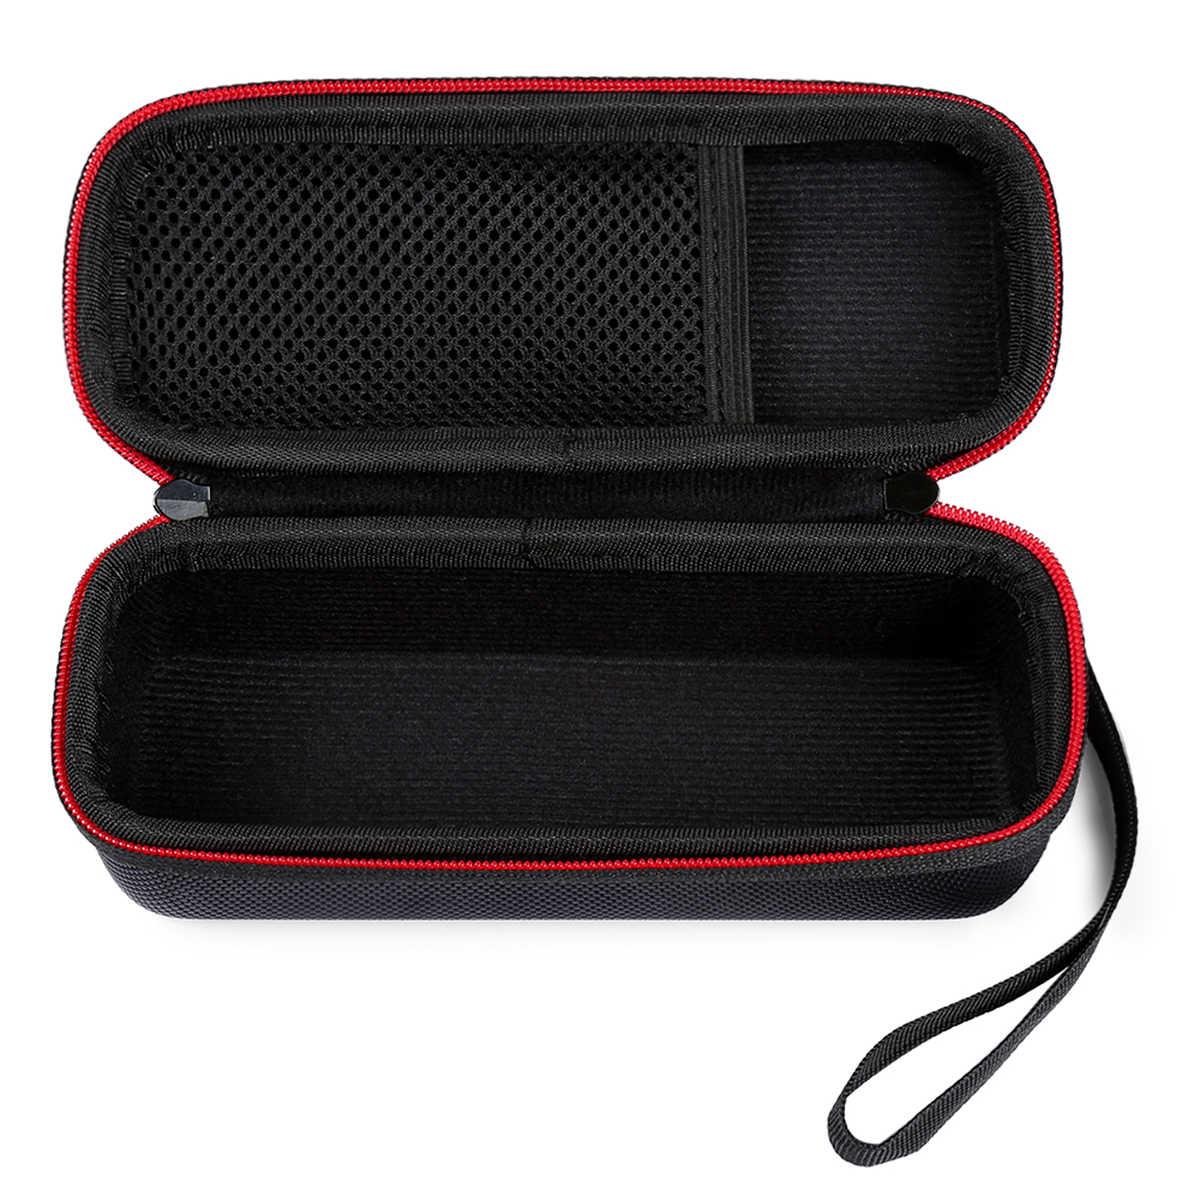 Tragbare Reise Tragen Dual-Fahrer Lautsprecher Sound Fall Box Tasche Lagerung Pouch Für Anker SoundCore 1 Bluetooth Lautsprecher